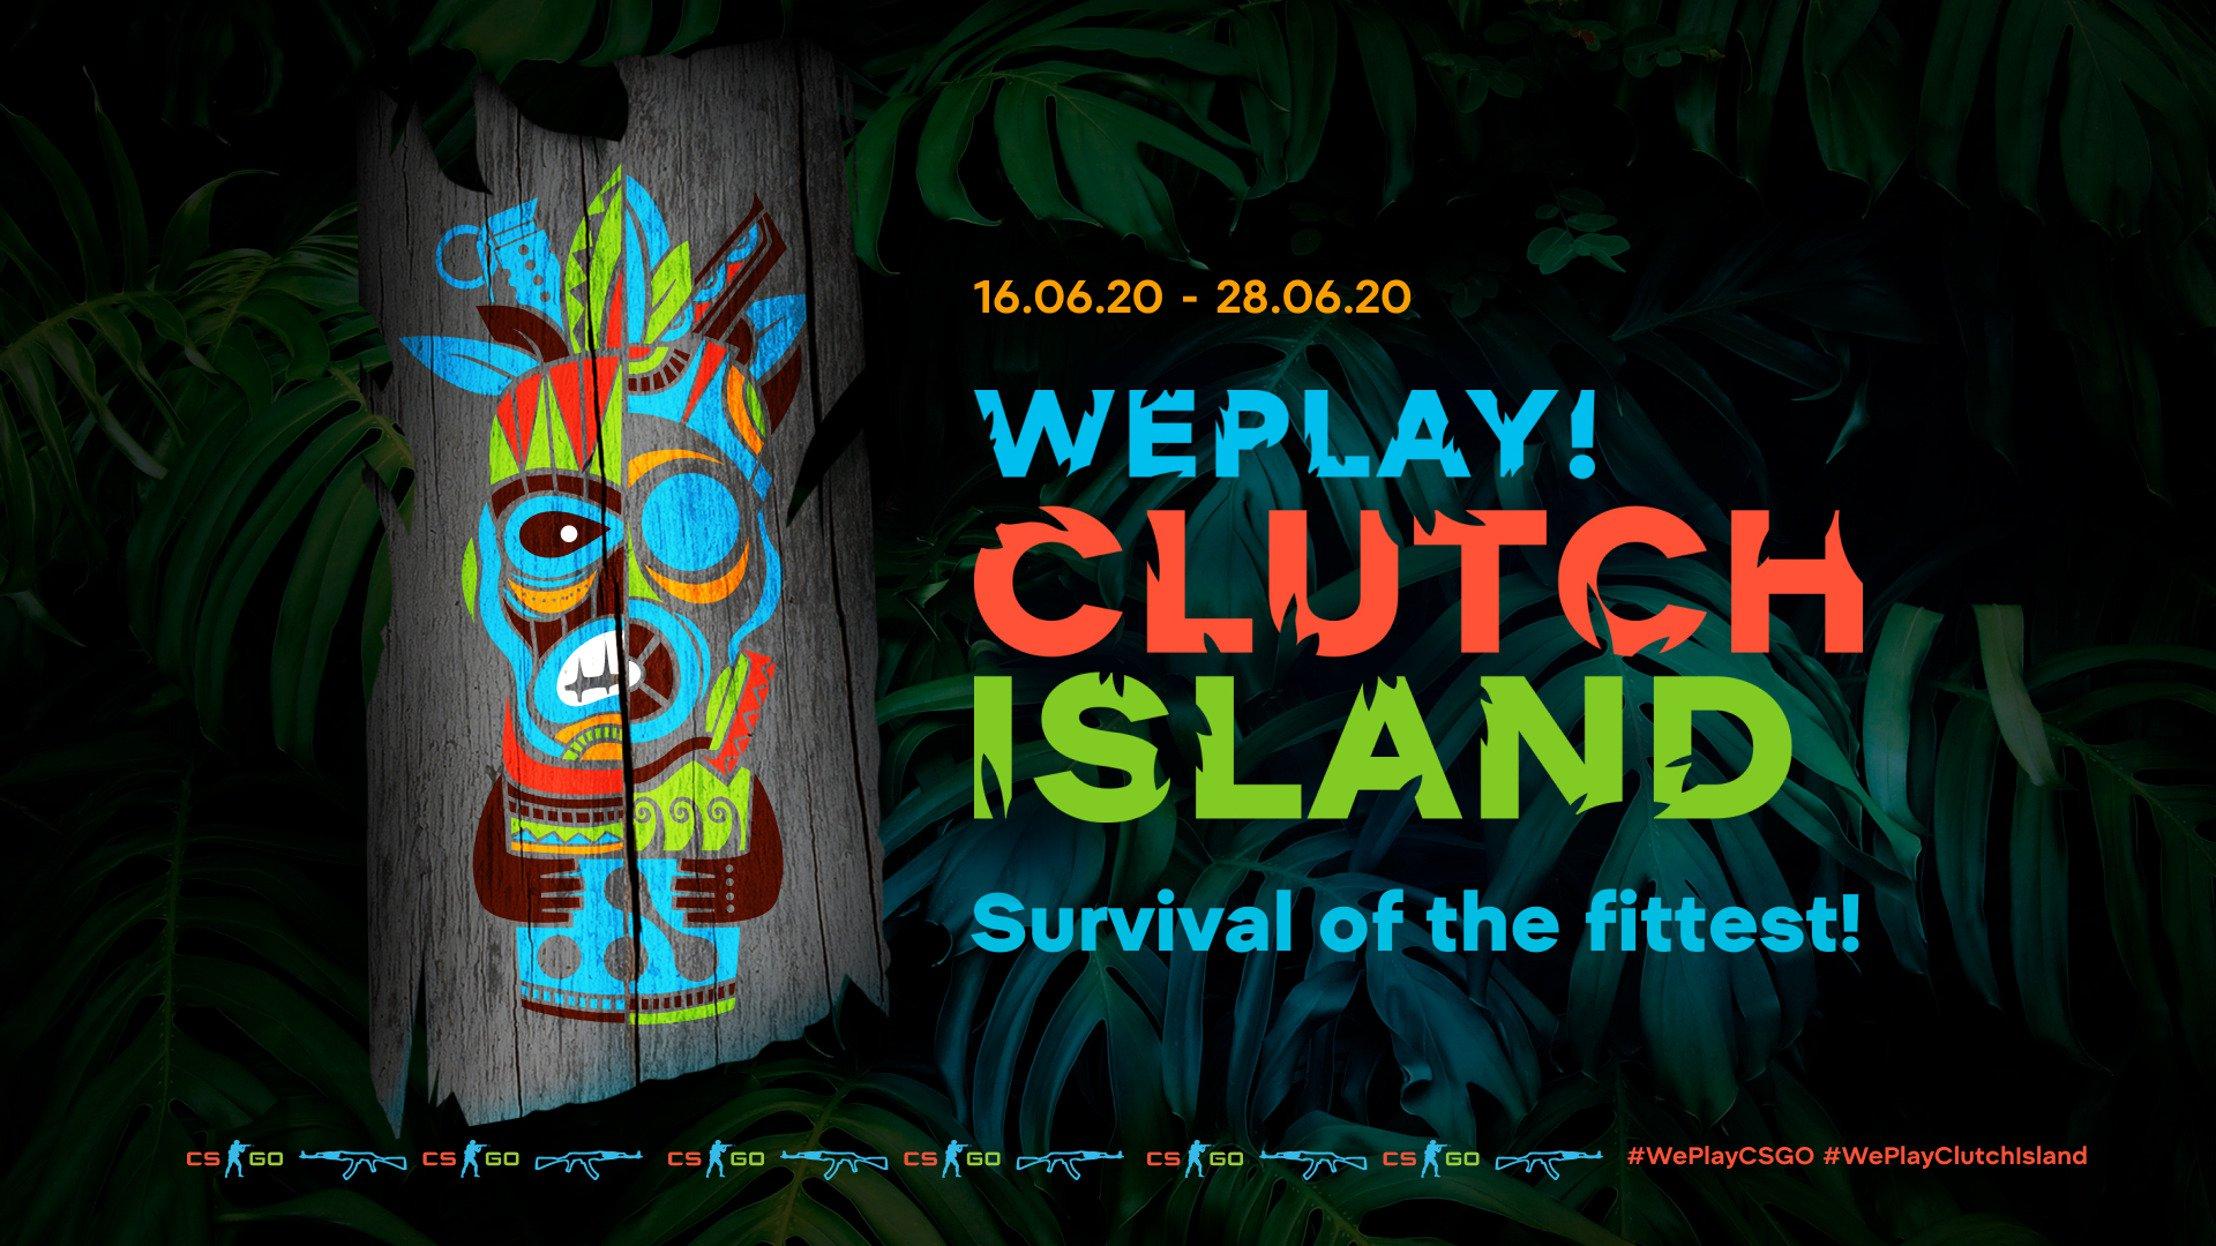 NAVI is the winner of WePlay! Clutch Island